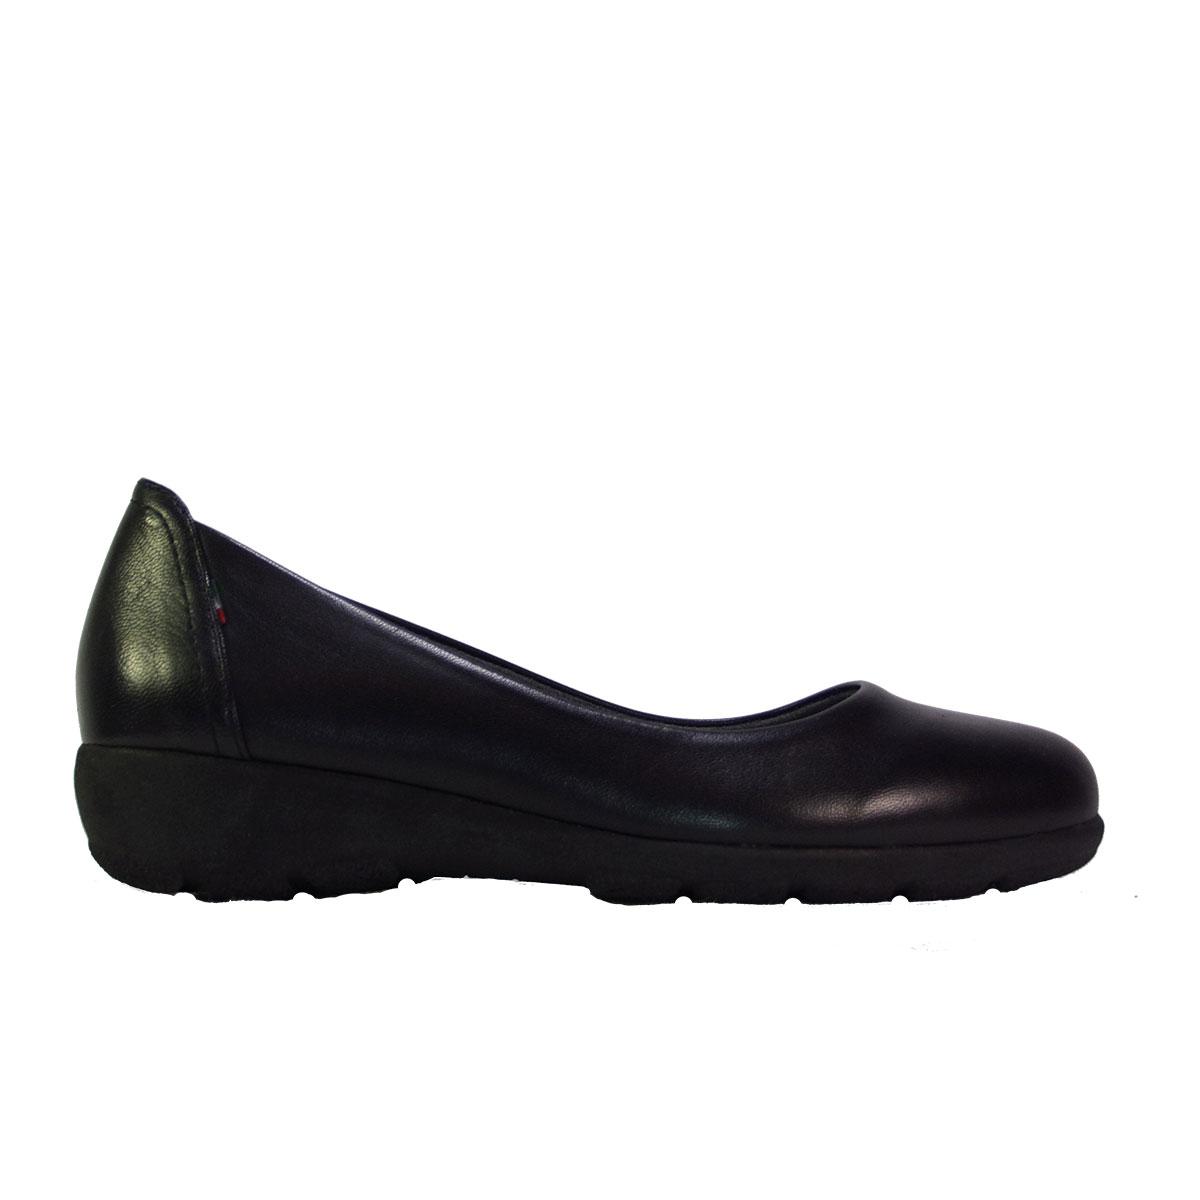 RAGAZZA 0461 Γυναικεία Παπούτσια Μπαλαρίνες Δερμάτινες Μαύρο ... 96864cff1bd